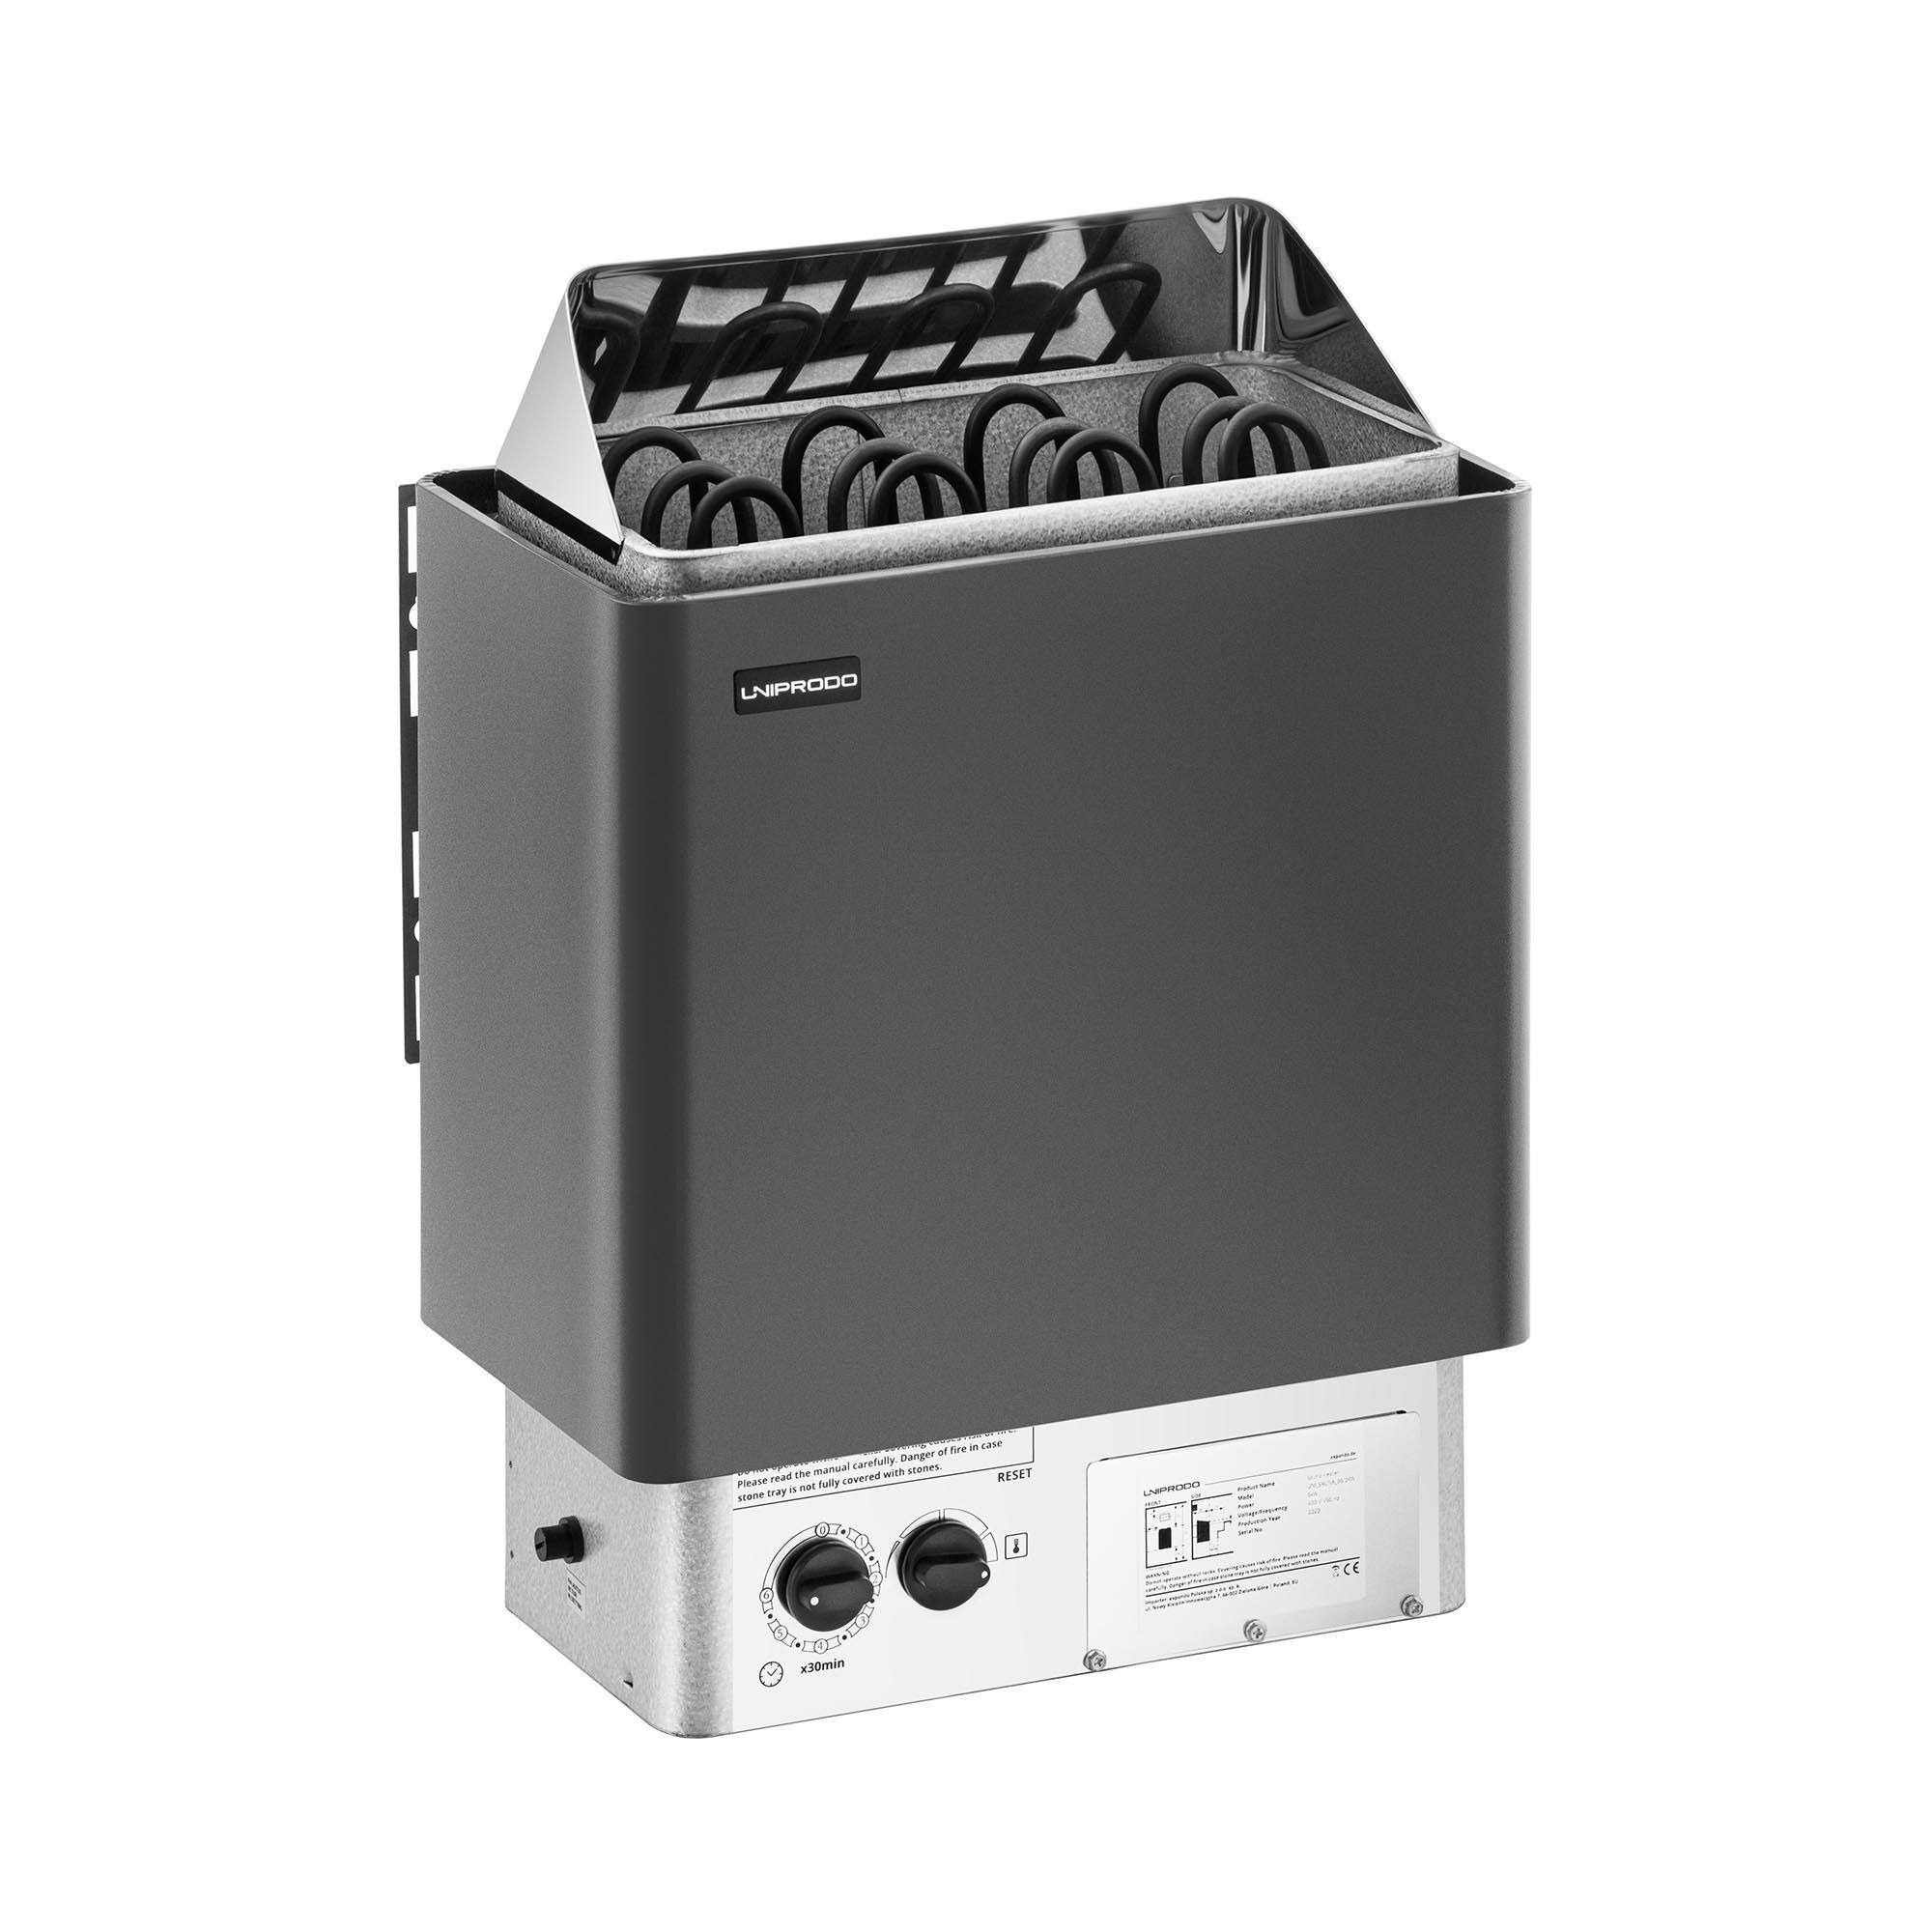 Uniprodo Sauna Heater - 6 kW - 30 to 110 °C - incl. control panel UNI_SAUNA_B6.0KW